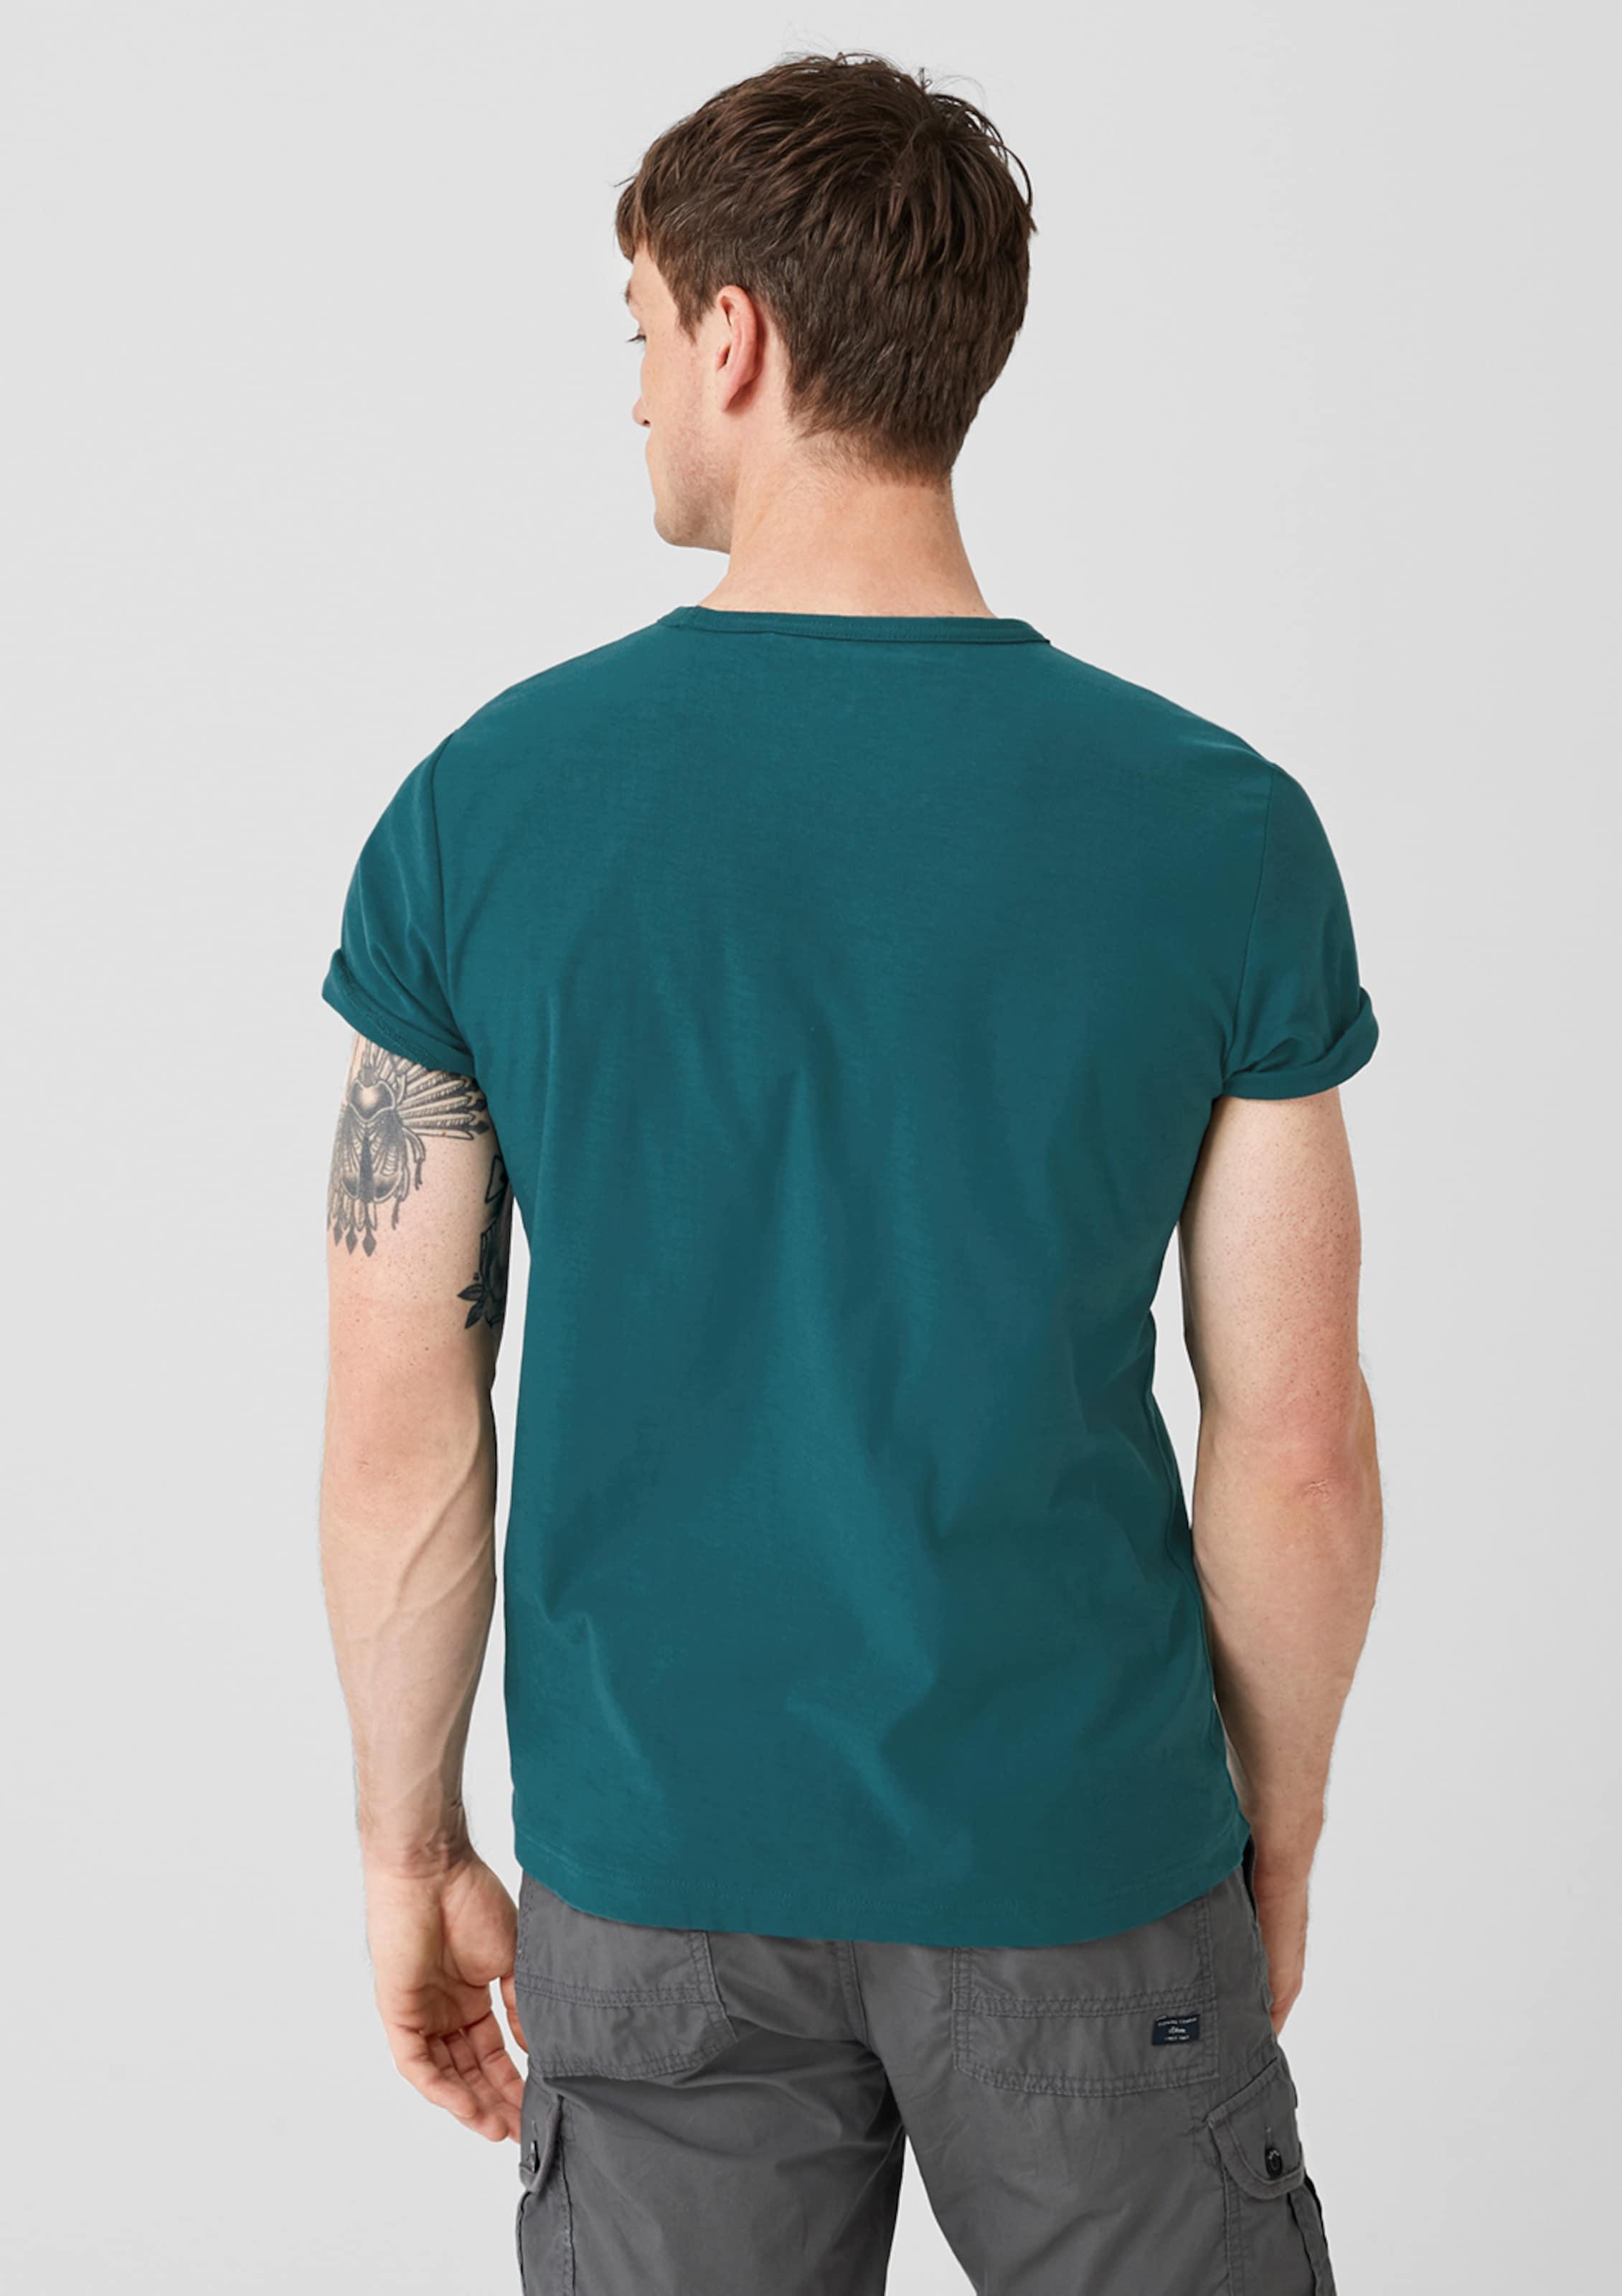 Shirt oliver S Shirt S Shirt S Petrol In oliver In oliver In Petrol Aj53RL4q